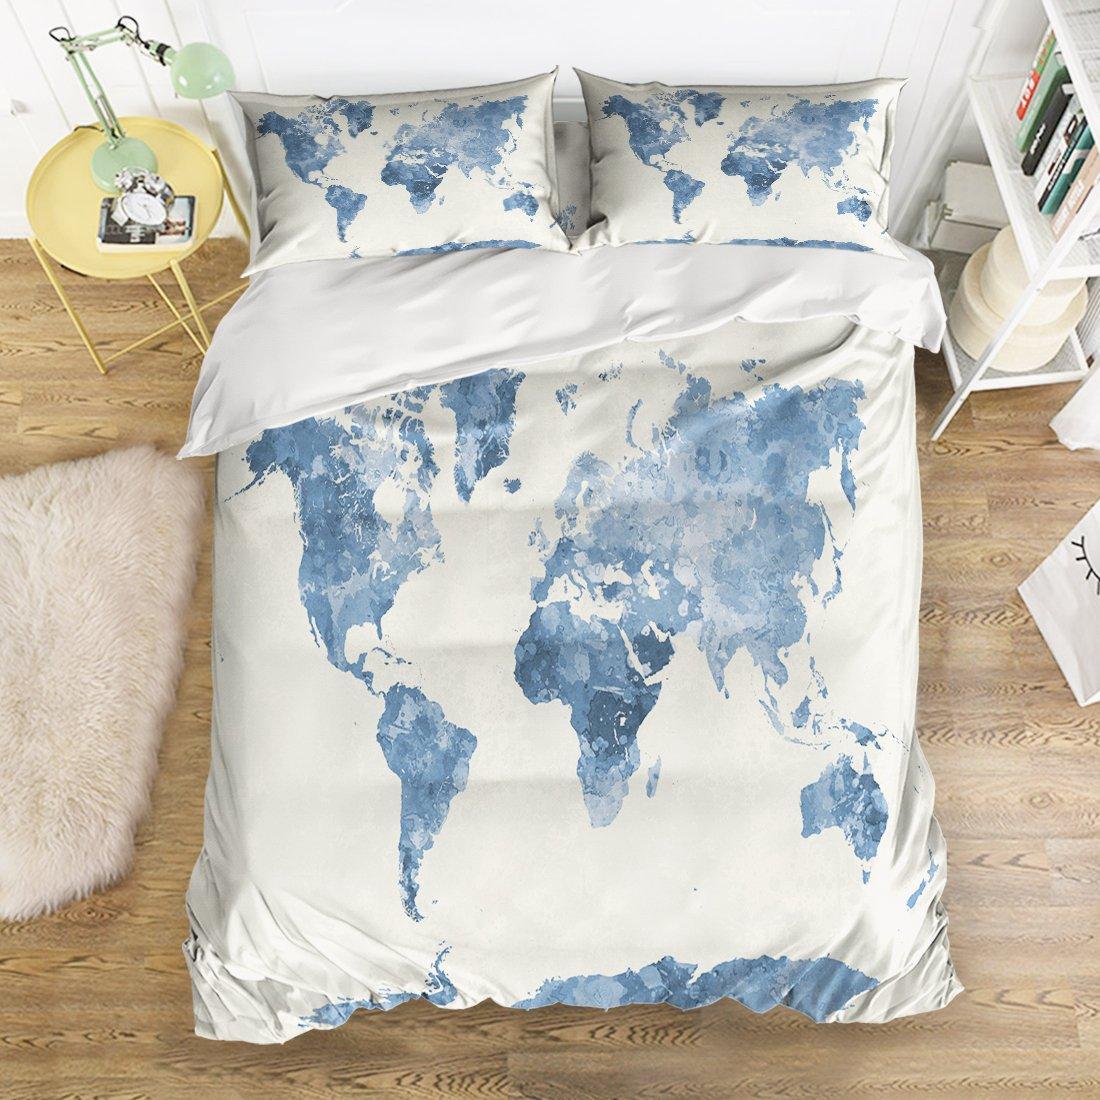 Full Size Bedding Set- World Map Duvet Cover Set Bedspread for Childrens/Kids/Teens/Adults, 4 Piece